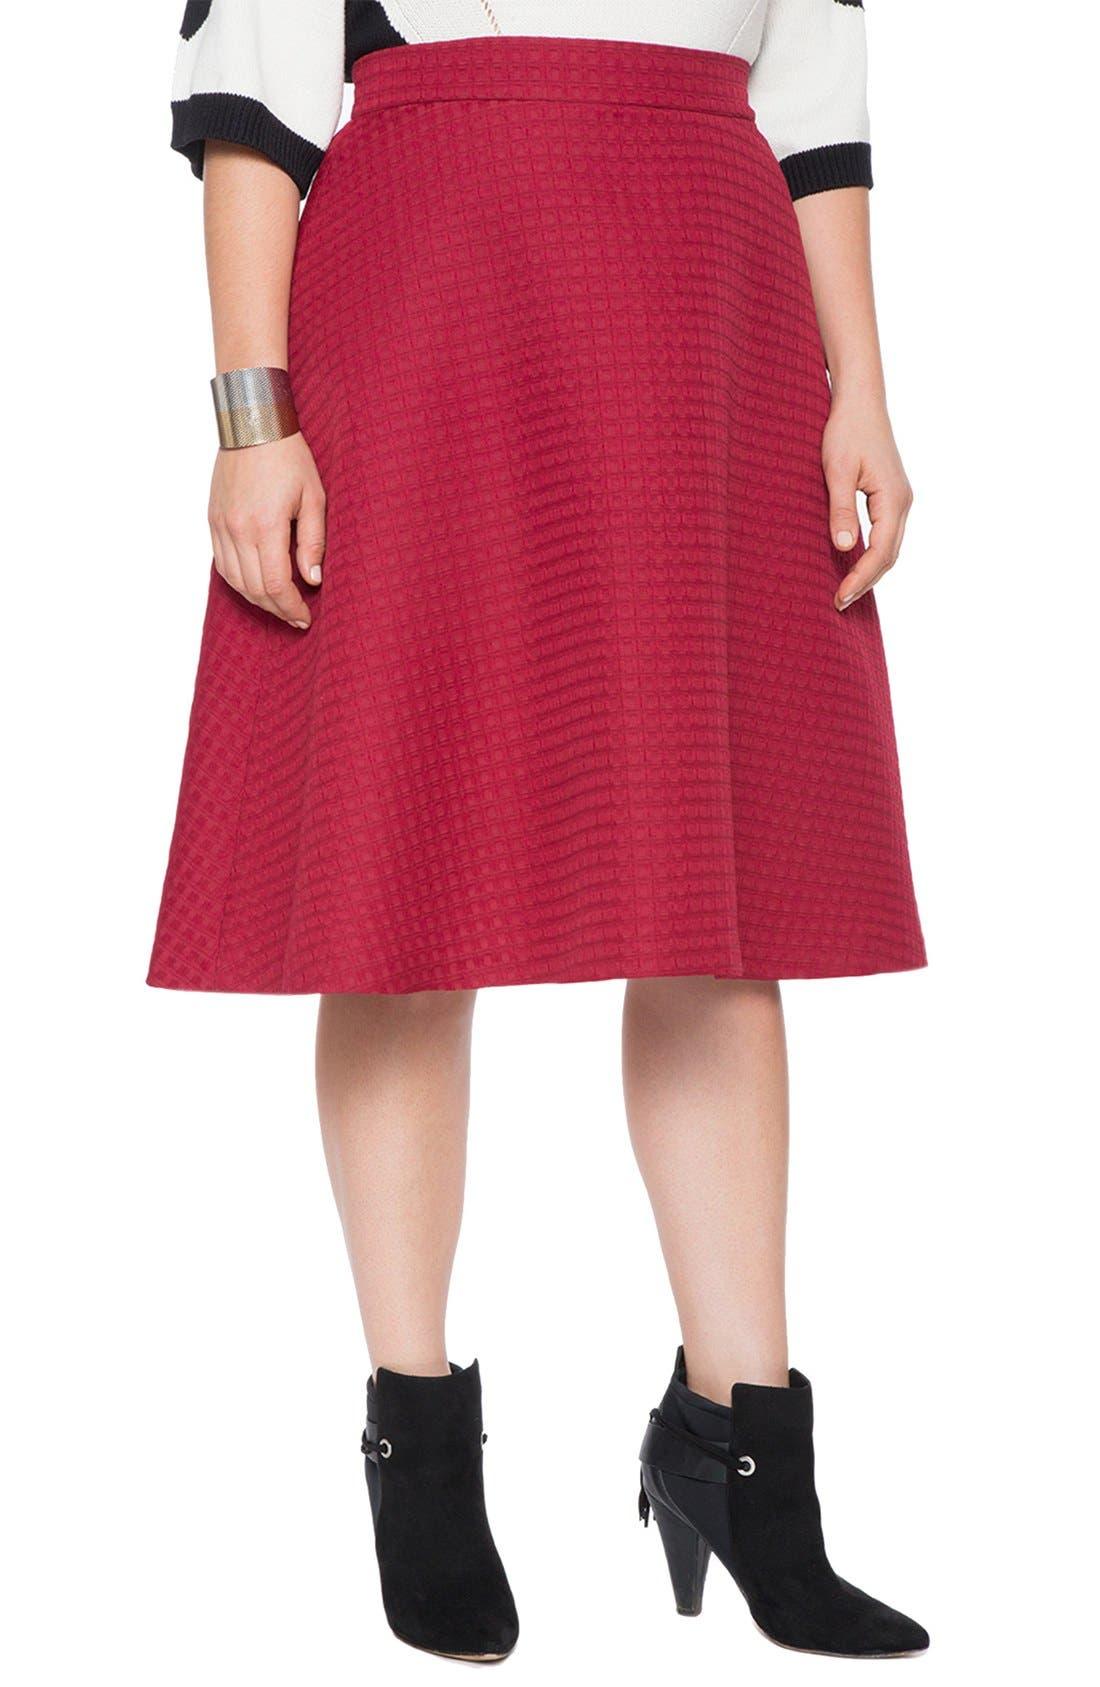 Alternate Image 1 Selected - ELOQUII Brocade Circle Skirt (Plus Size